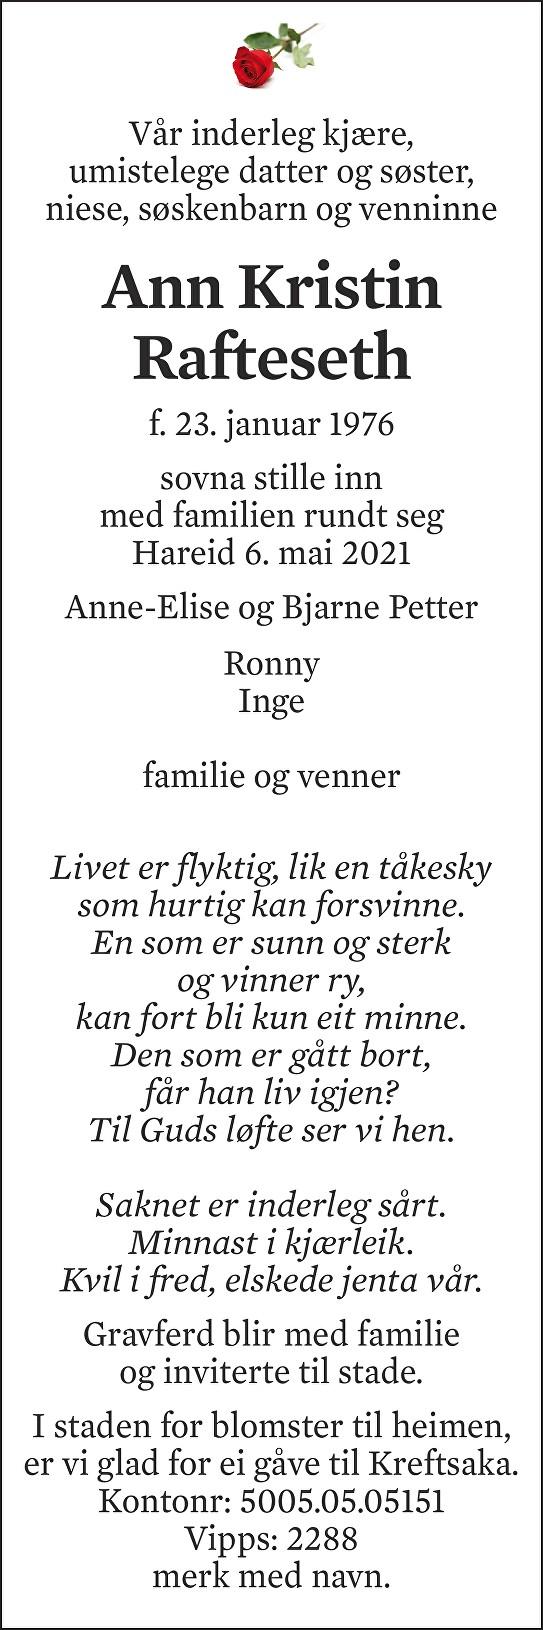 Ann Kristin Rafteseth Dødsannonse